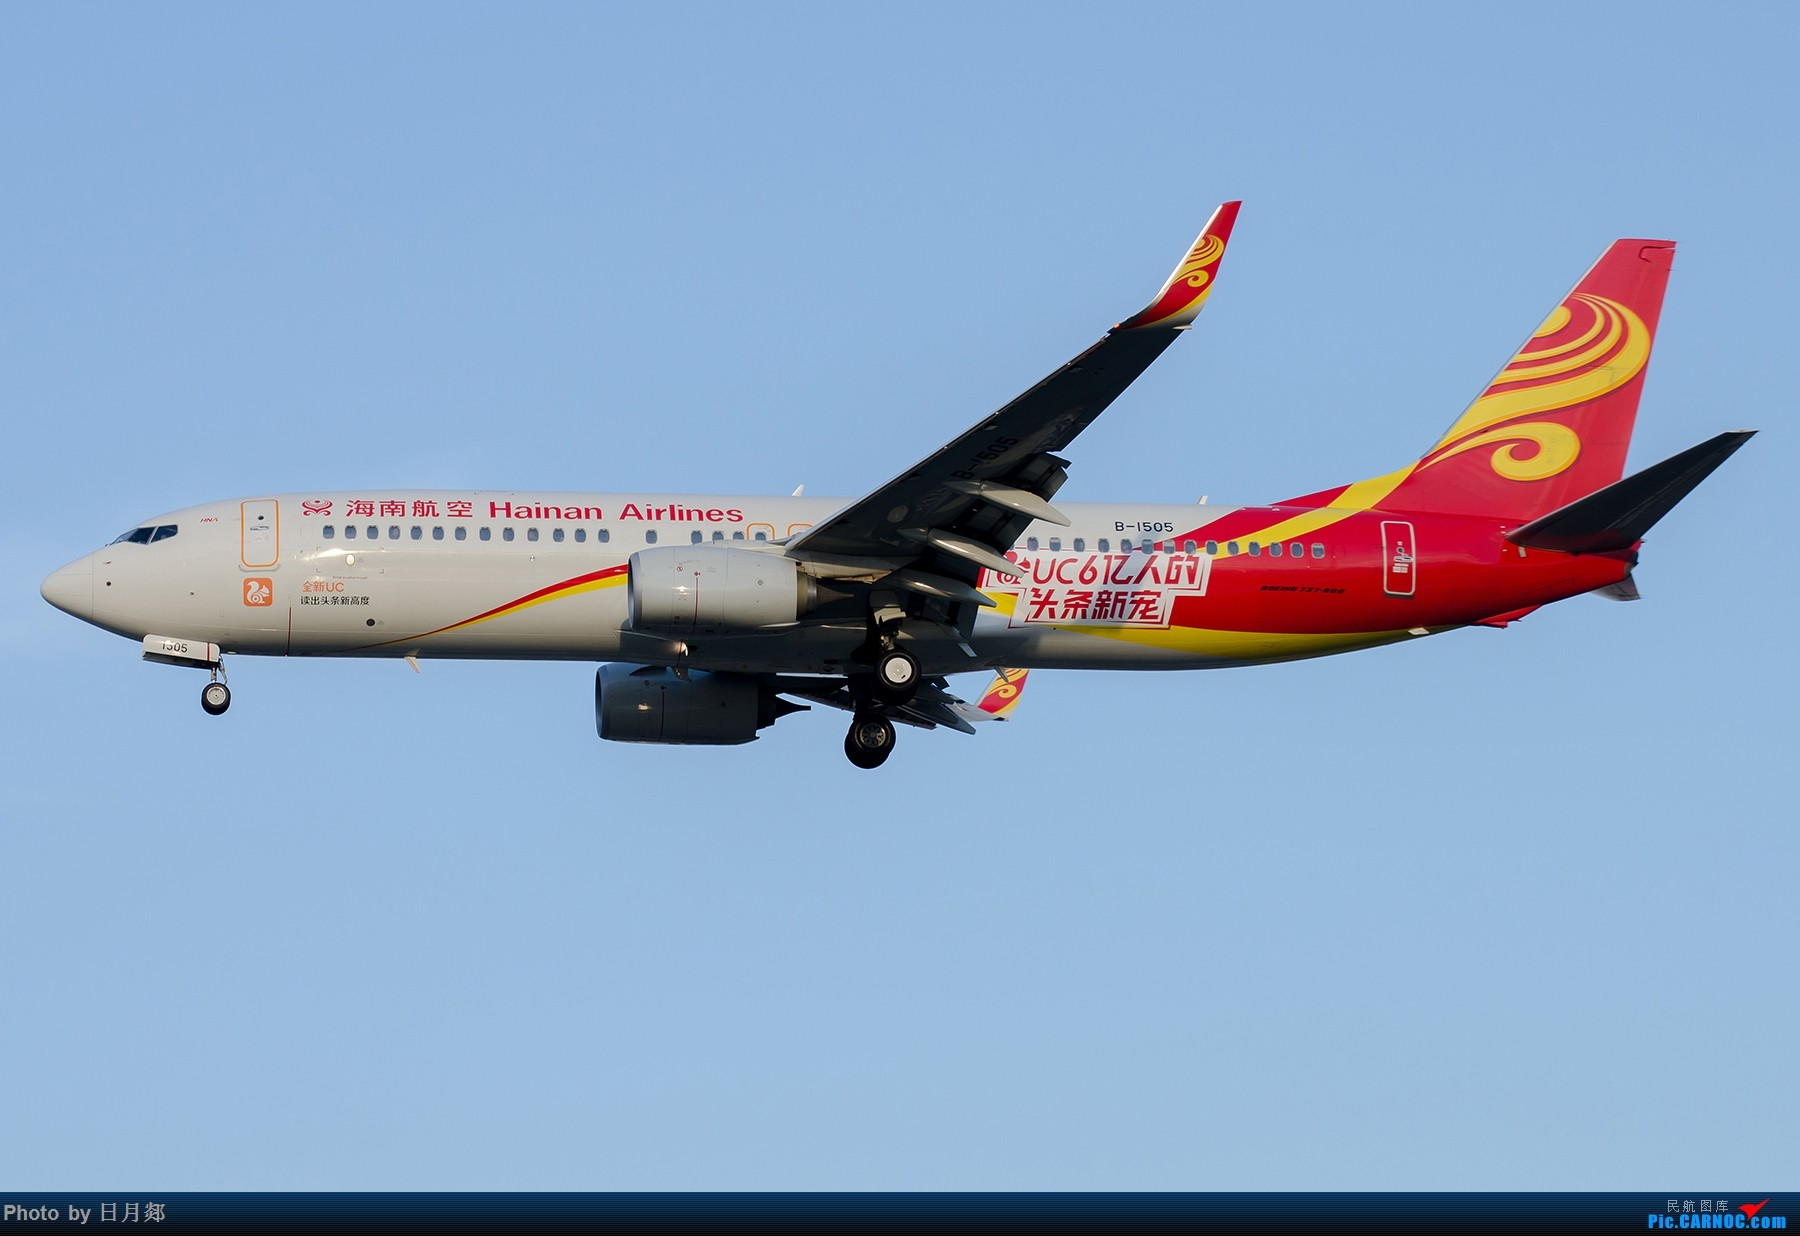 Re:[原创]【SHA拍机*1800大图】轻度污染来临前宝贵的蓝天,且拍且珍惜 BOEING 737-800 B-1505 中国上海虹桥国际机场